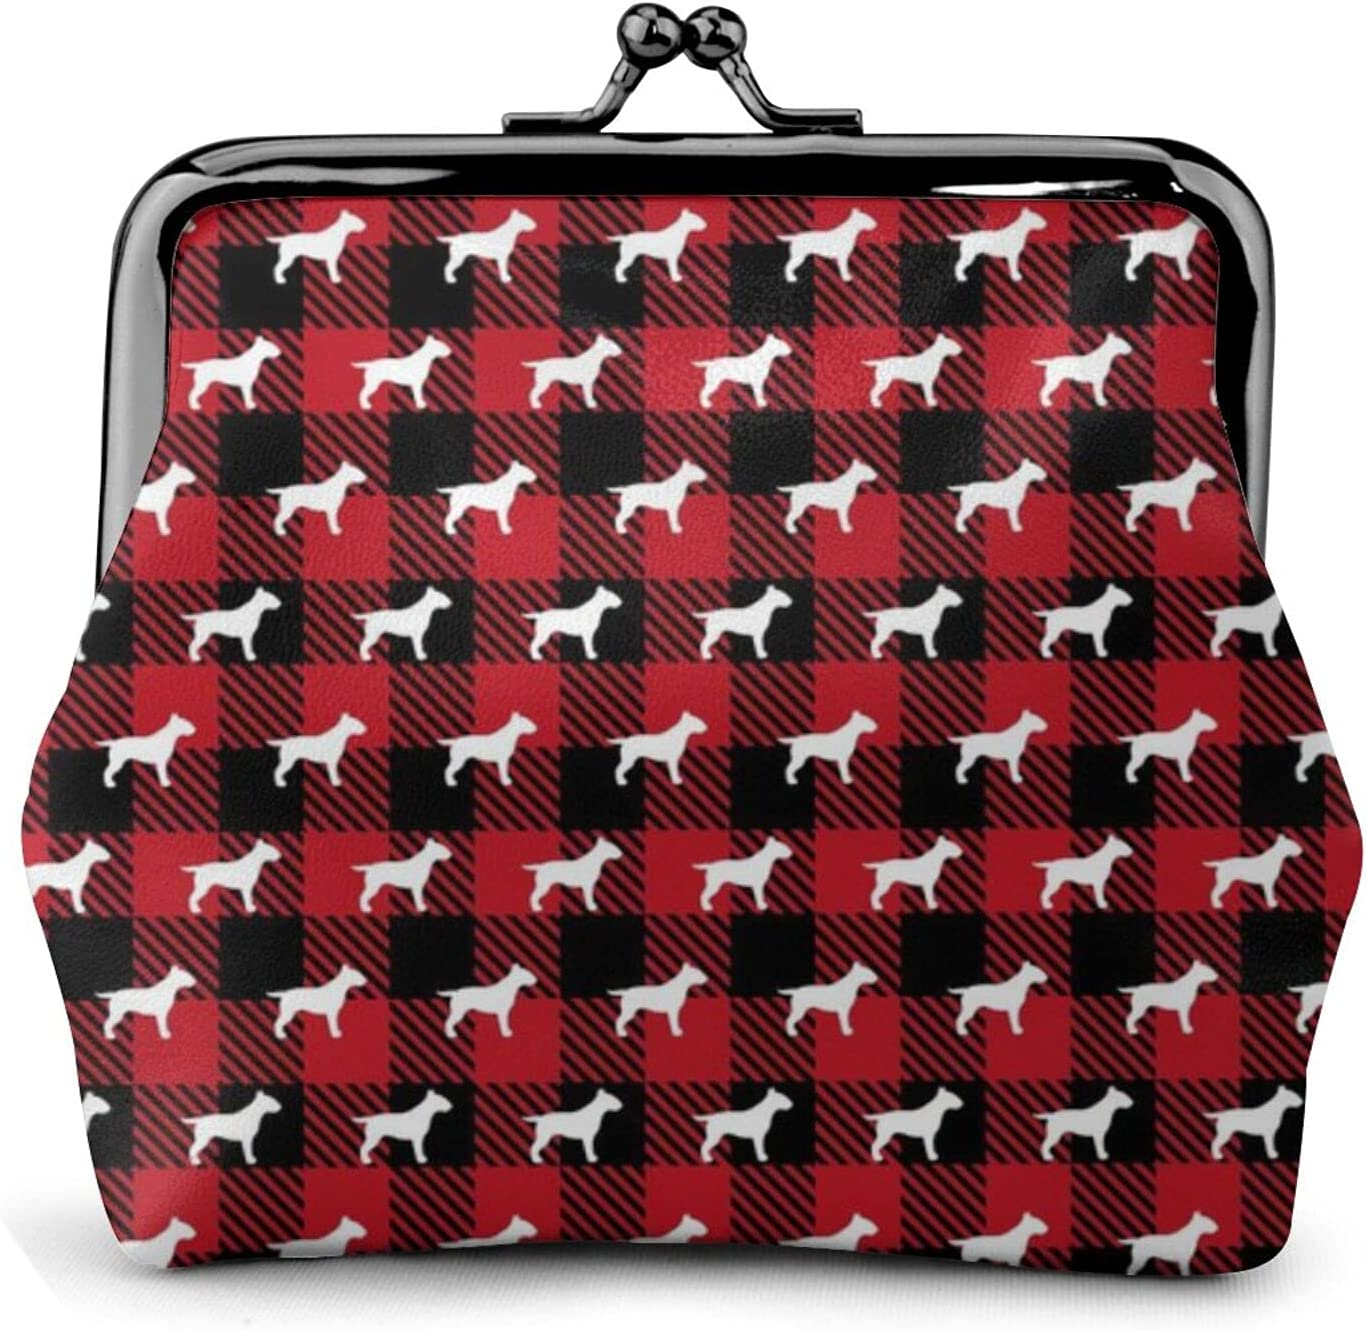 Bull Terrier Buffalo 1282 Women'S Wallet Buckle Coin Purses Pouch Kiss-lock Change Travel Makeup Wallets, Black, One Size